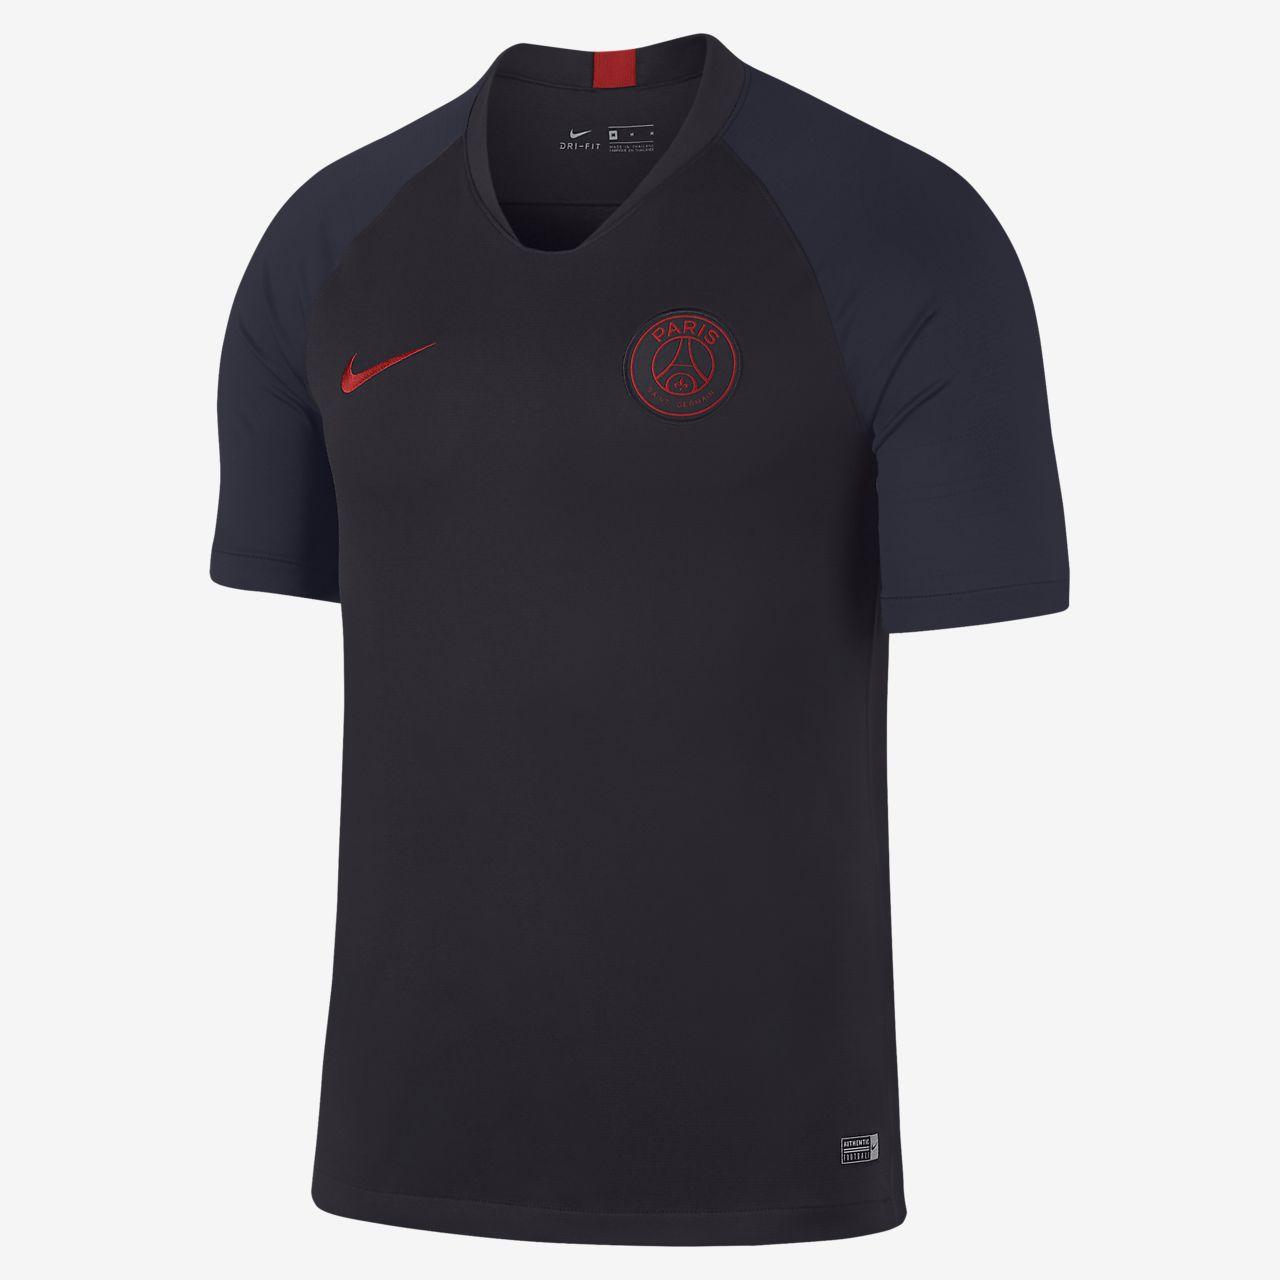 Maglia da calcio a manica corta Nike Breathe Paris Saint-Germain Strike - Uomo